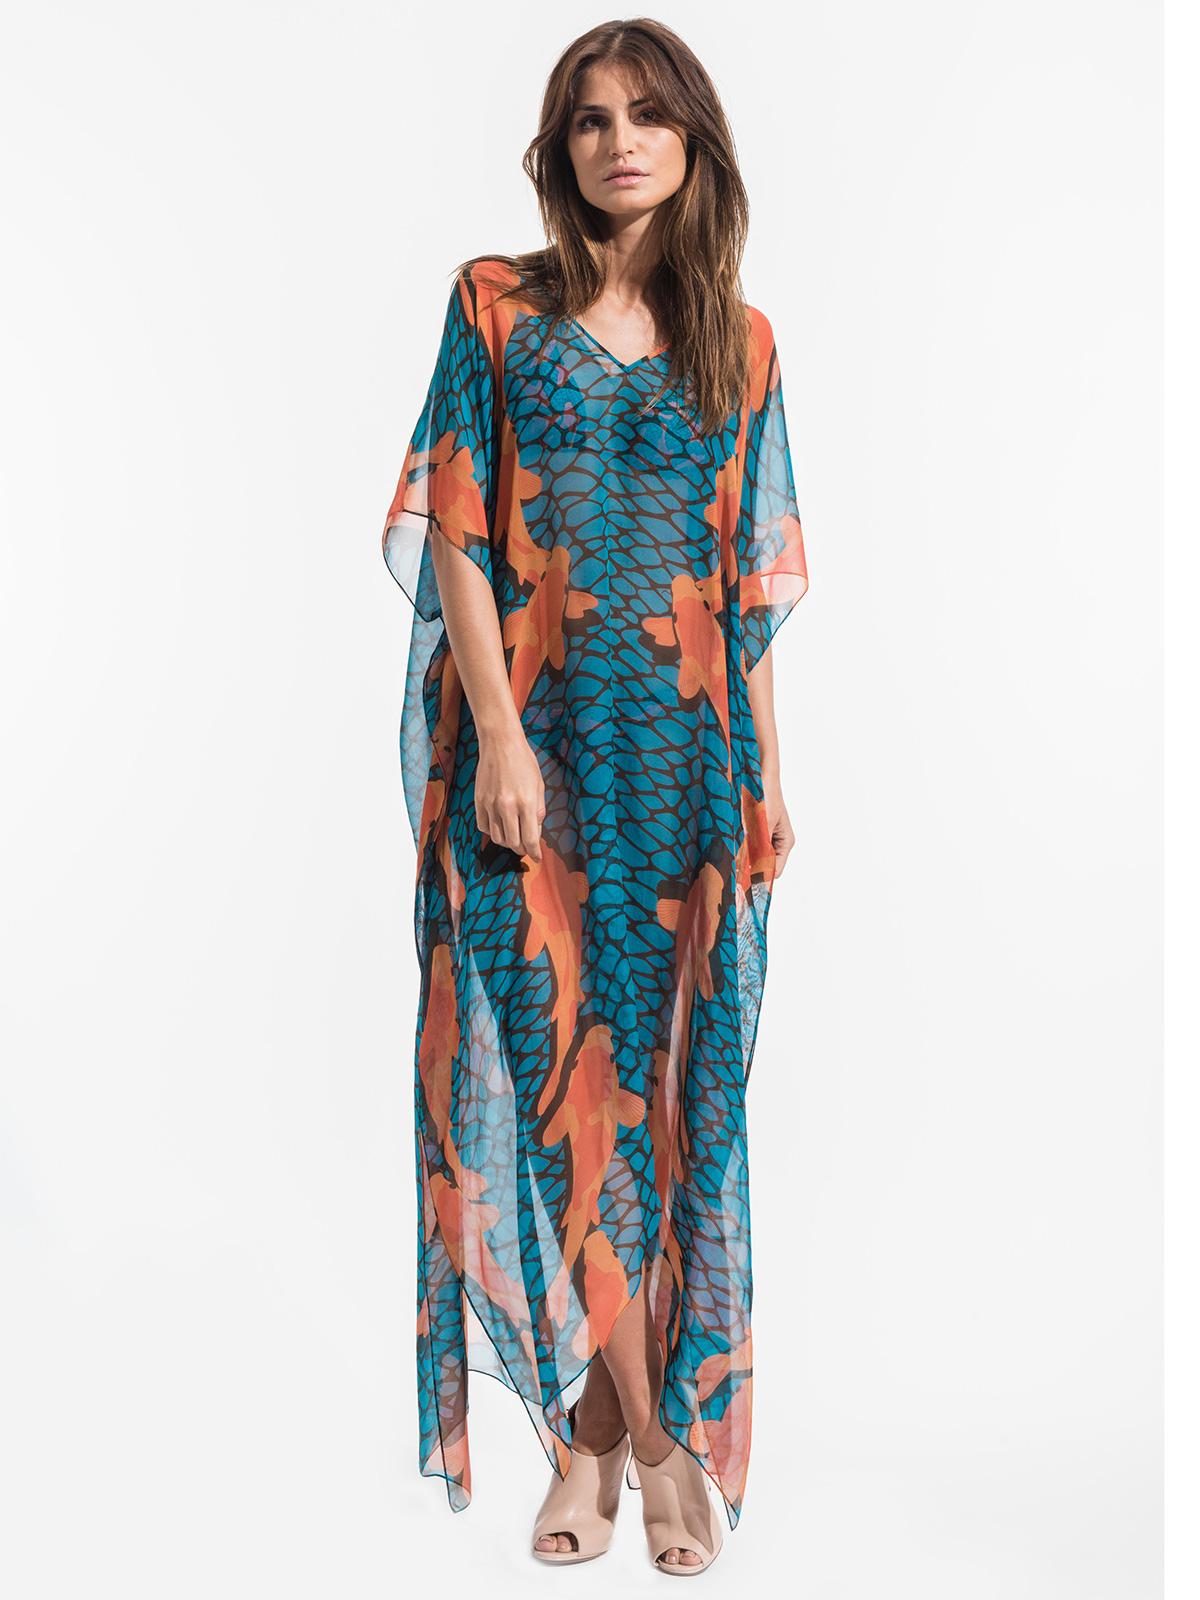 Triya Long Blue Silk Dress With Orange Fish - Dress Carpas Azul